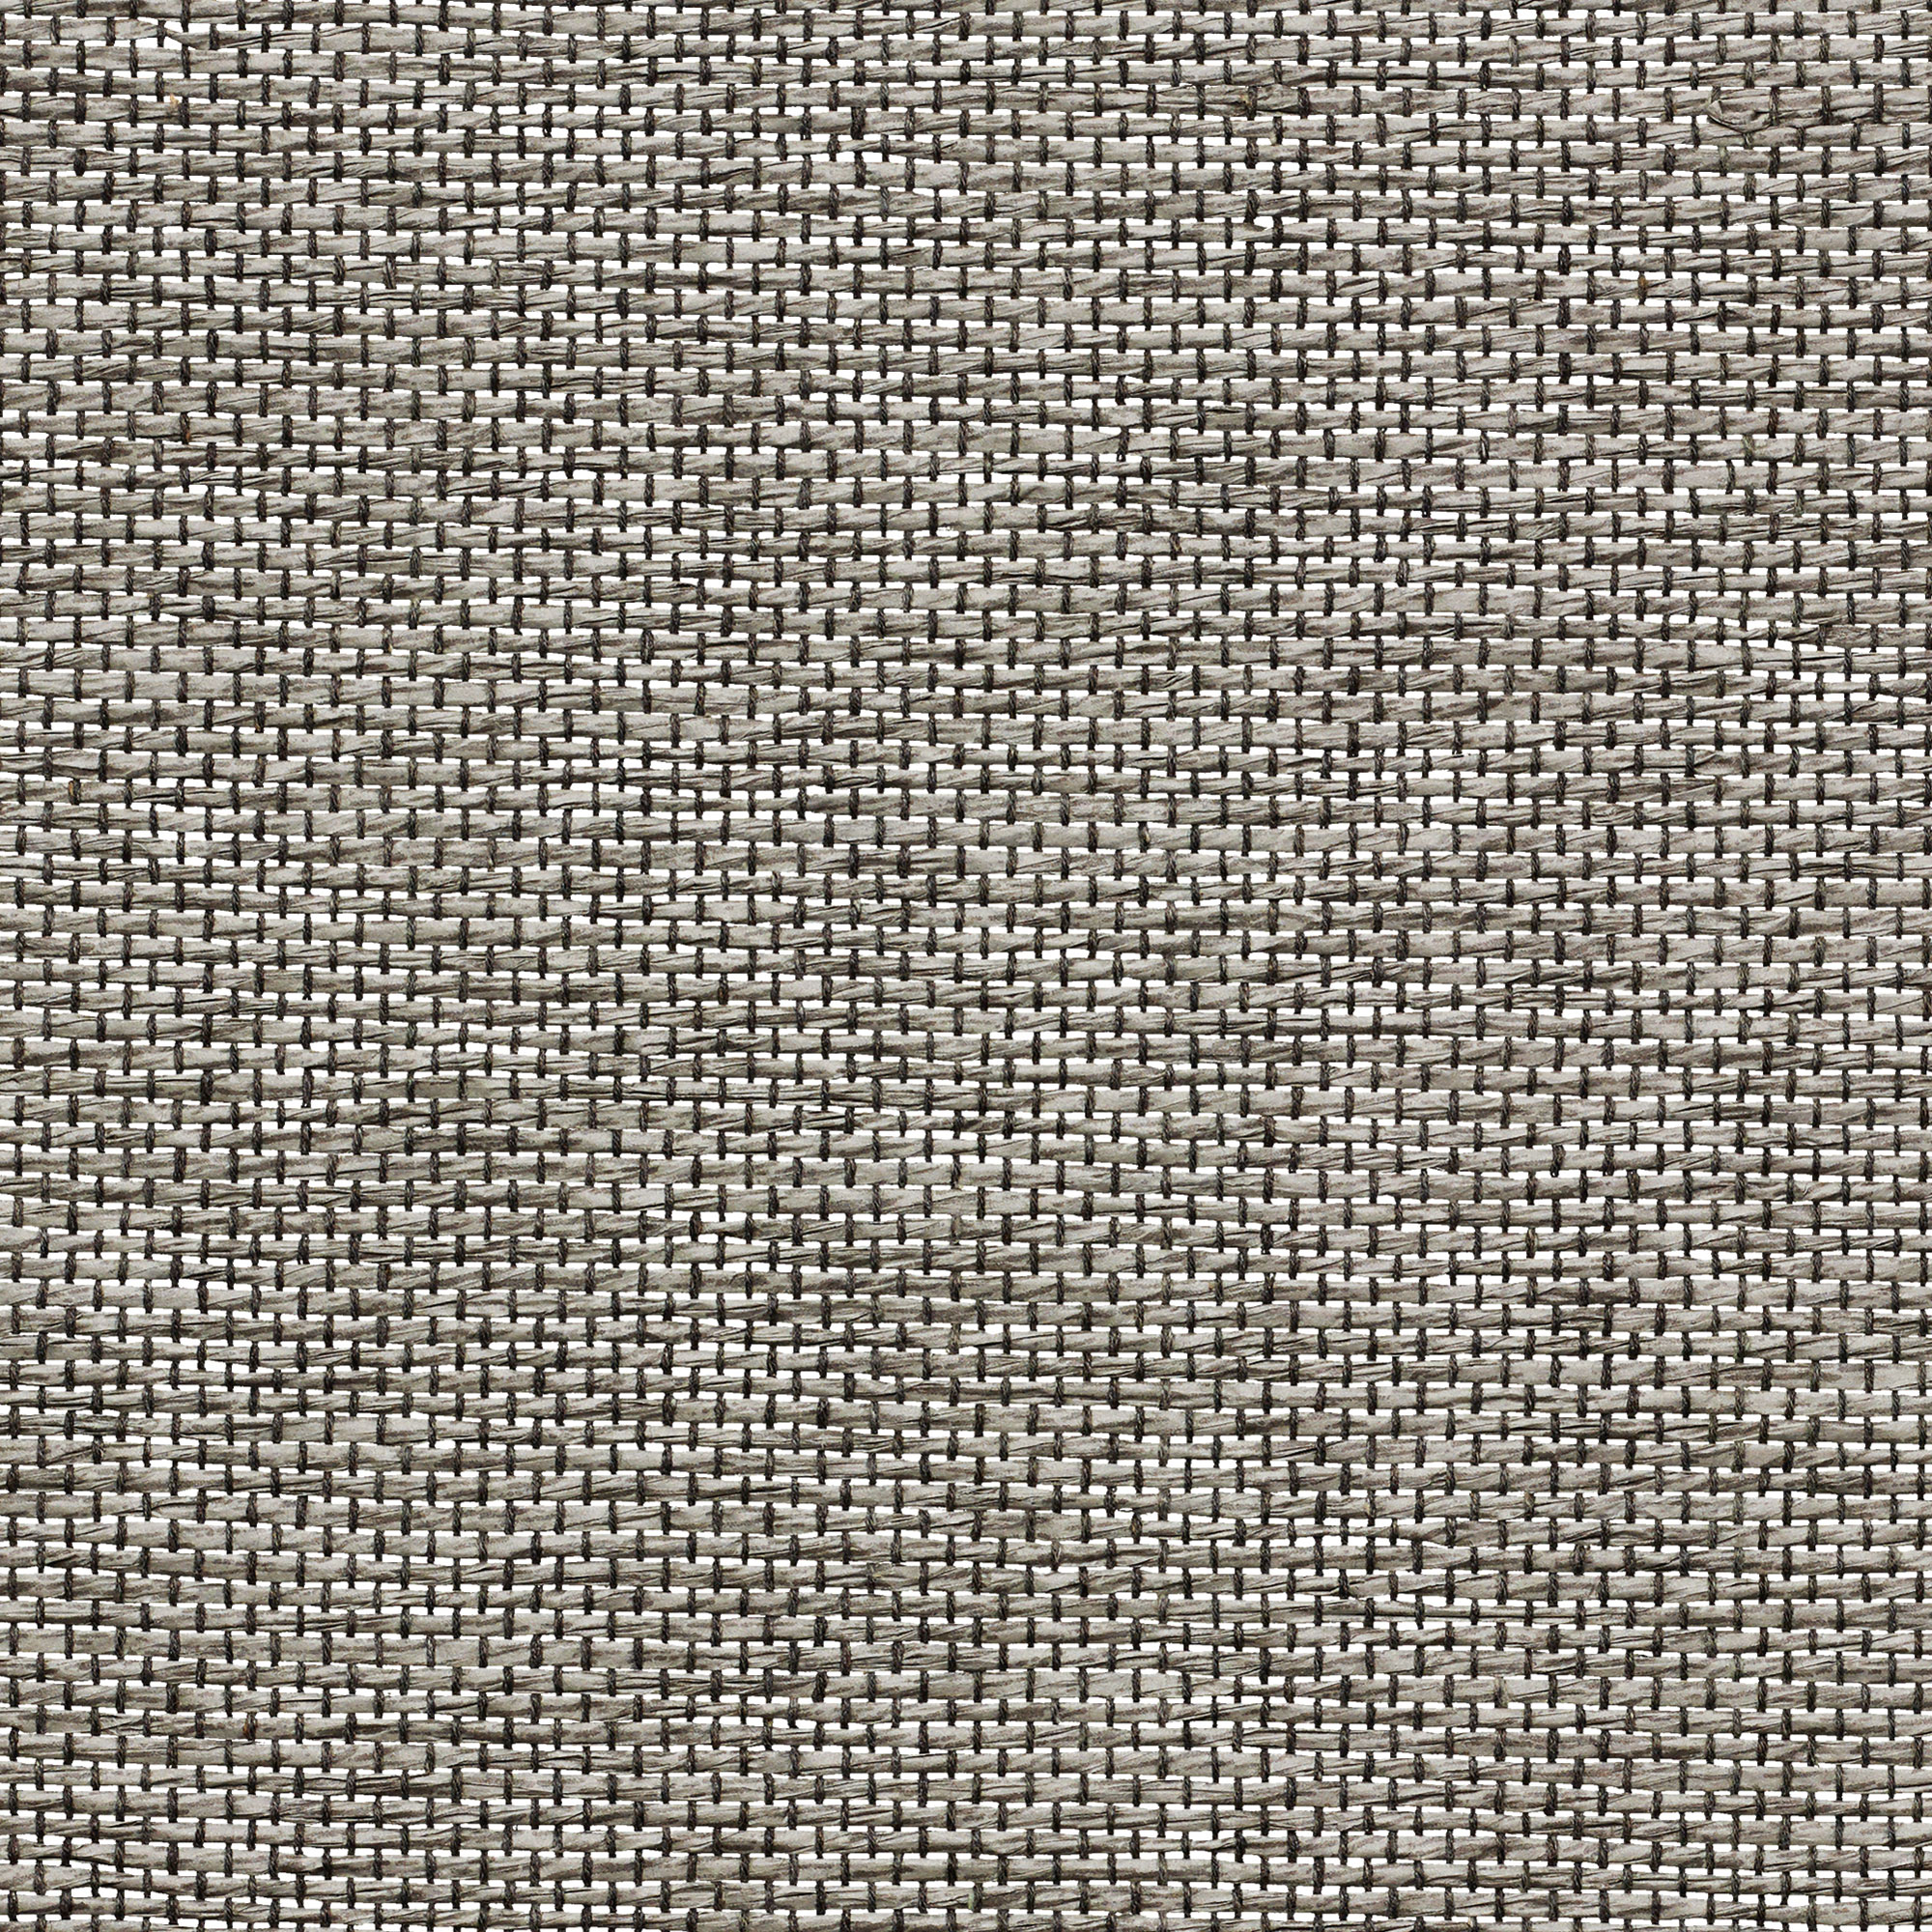 swatch-PE600-60-clarity-steady-graphite-web.jpg